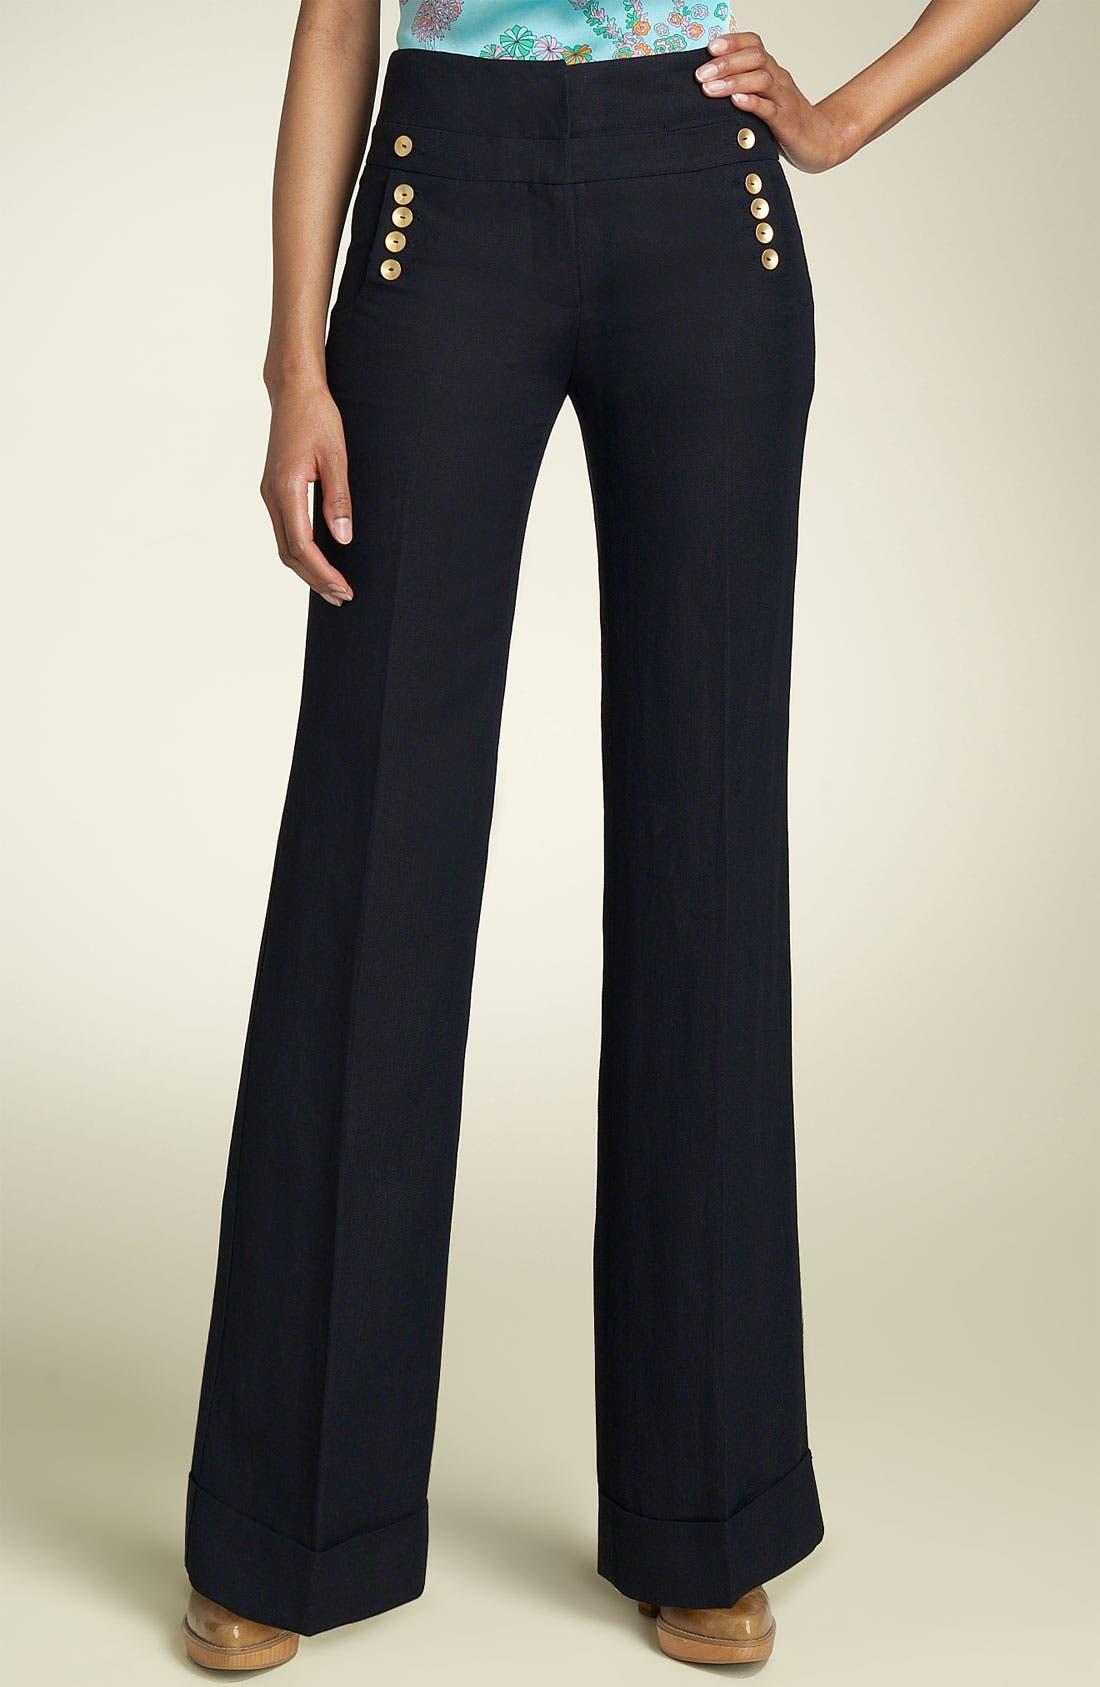 LEIFSDOTTIR 'Pebble' Wide Leg Pants, Main, color, 409